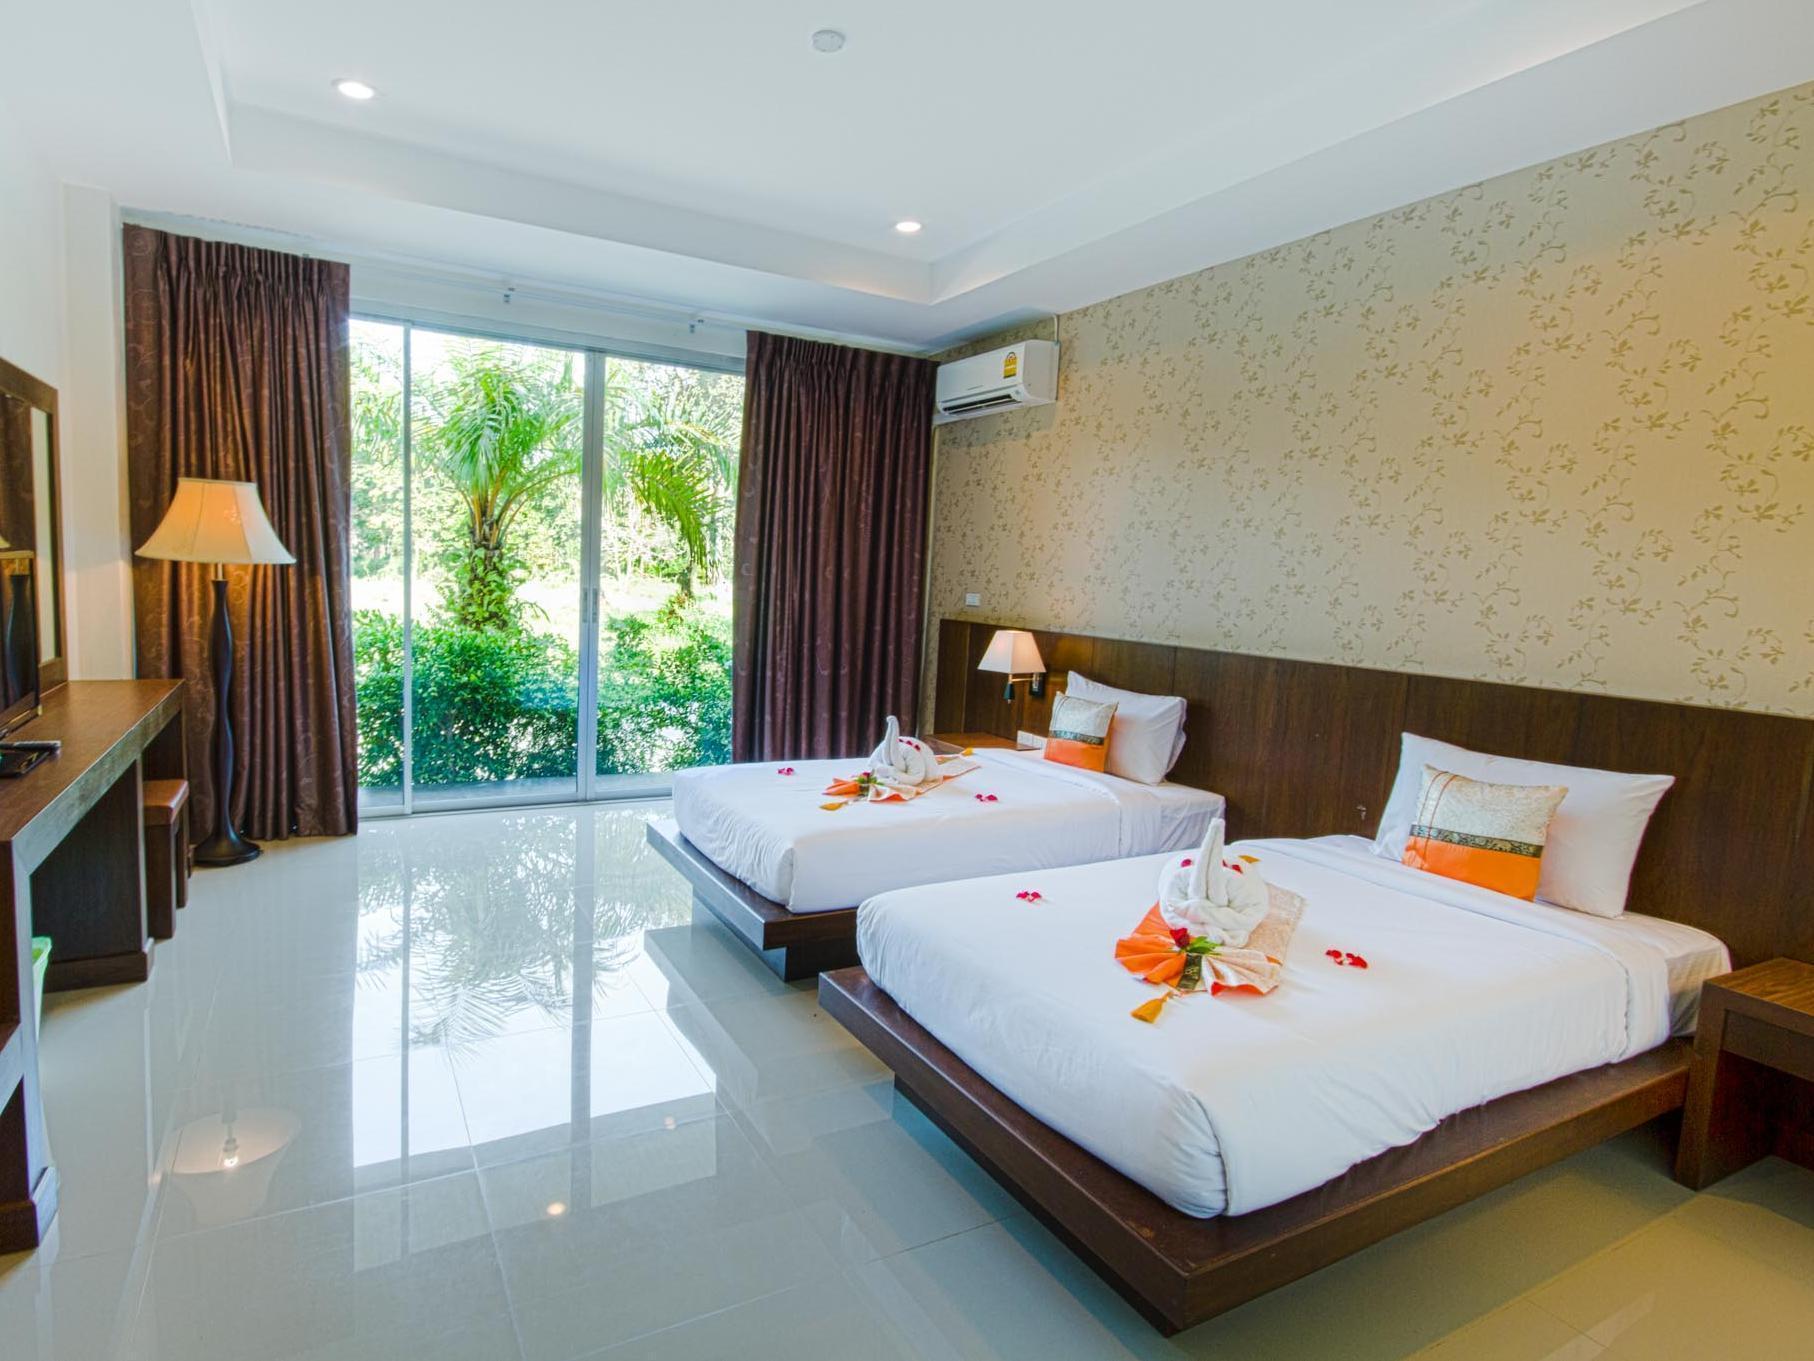 The Pano Hotel And Residence เดอะ พาโน โฮเต็ล แอนด์ เรสซิเดนซ์